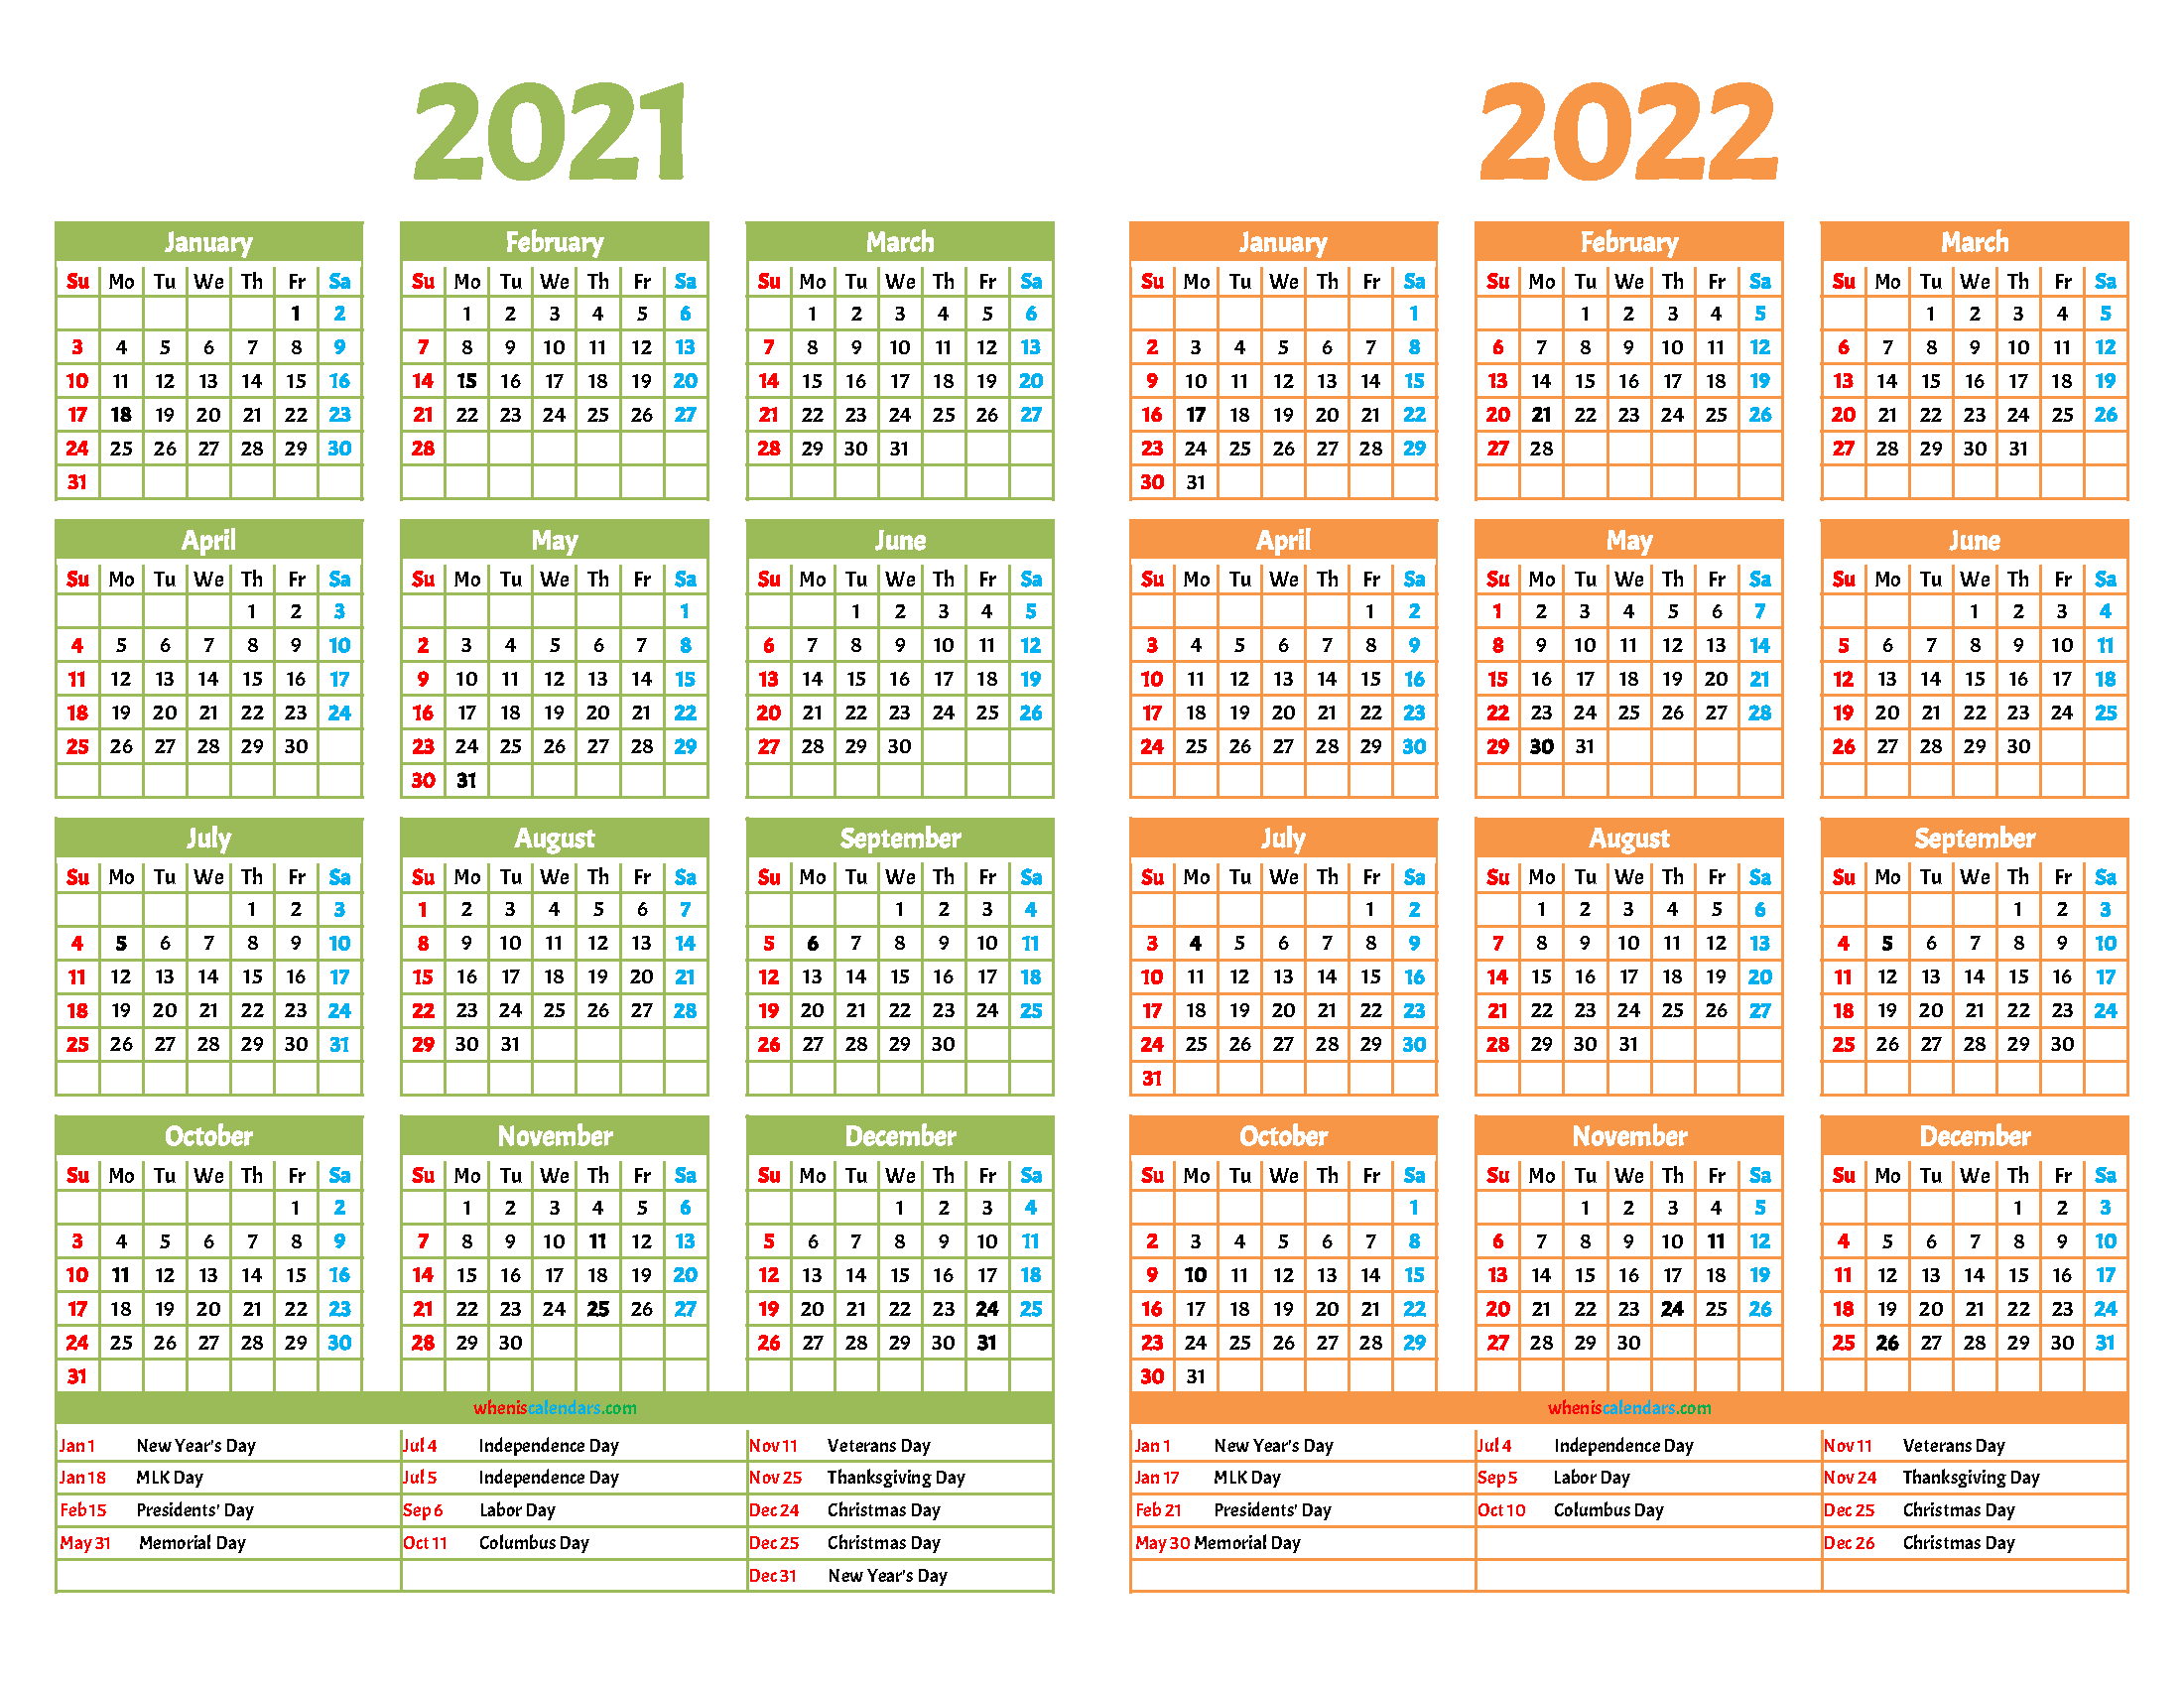 Usps Calendar 2022.Printable 2021 And 2022 Calendar 12 Templates Calendar Design Template Calendar Template Free Printable Calendar Monthly